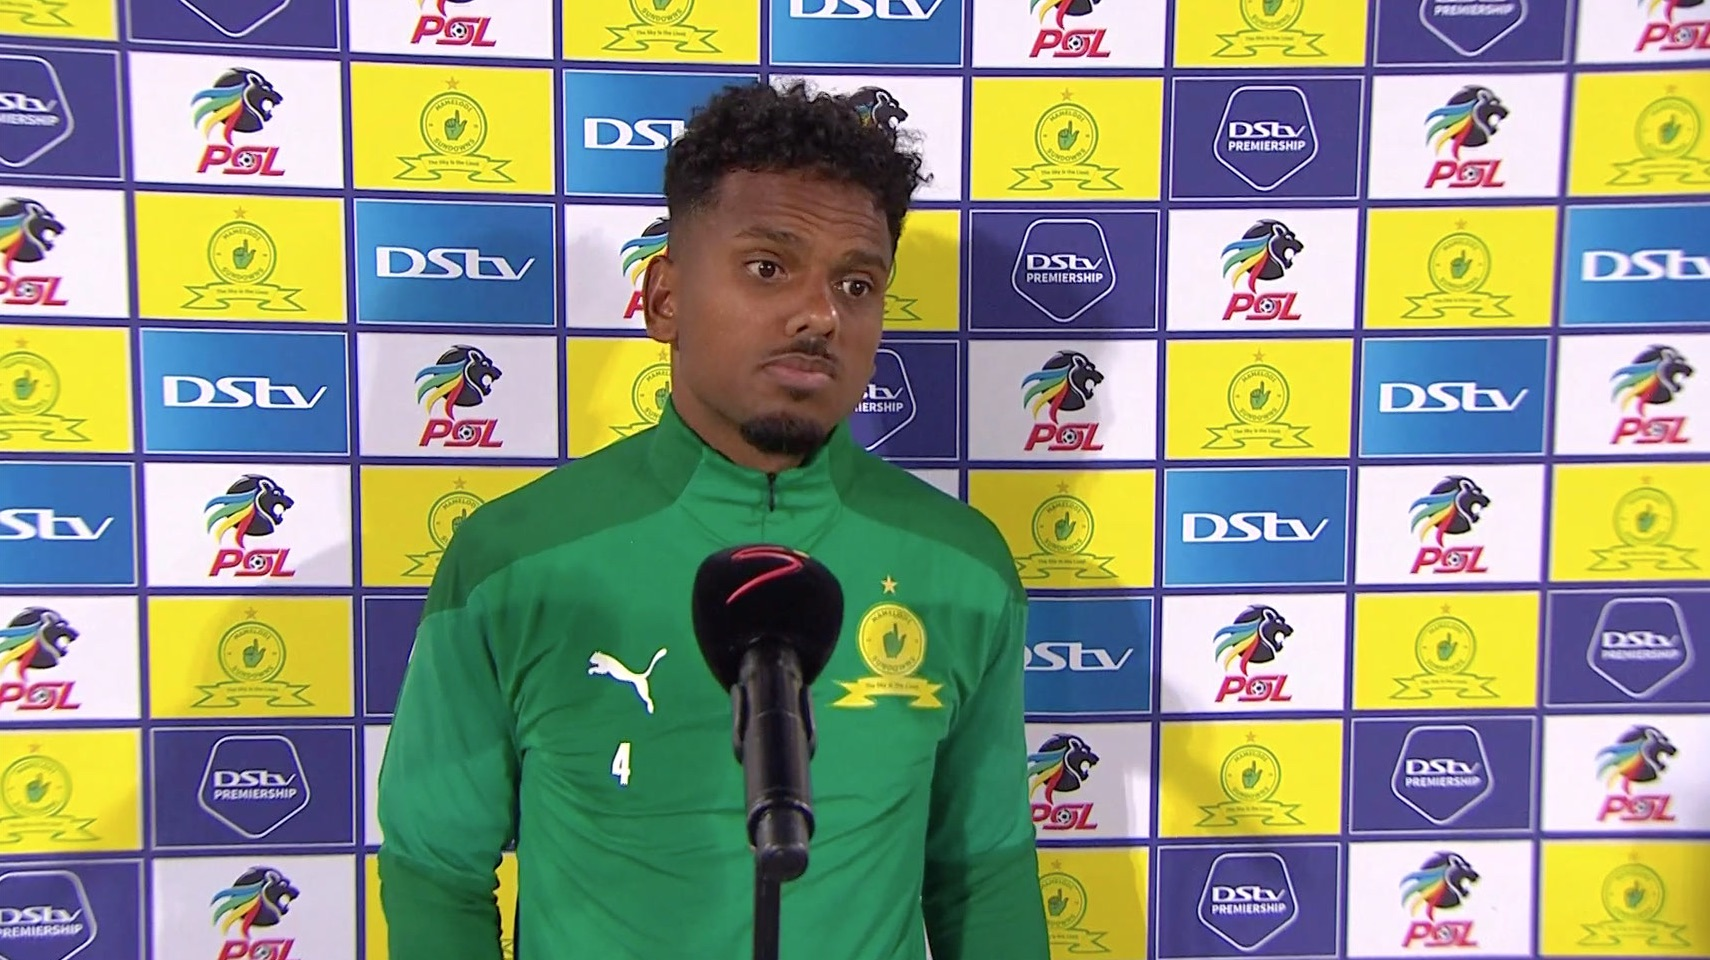 DStv Premiership | Mamelodi Sundowns v Stellenbosch FC  | Interview with Kermit and Manqoba